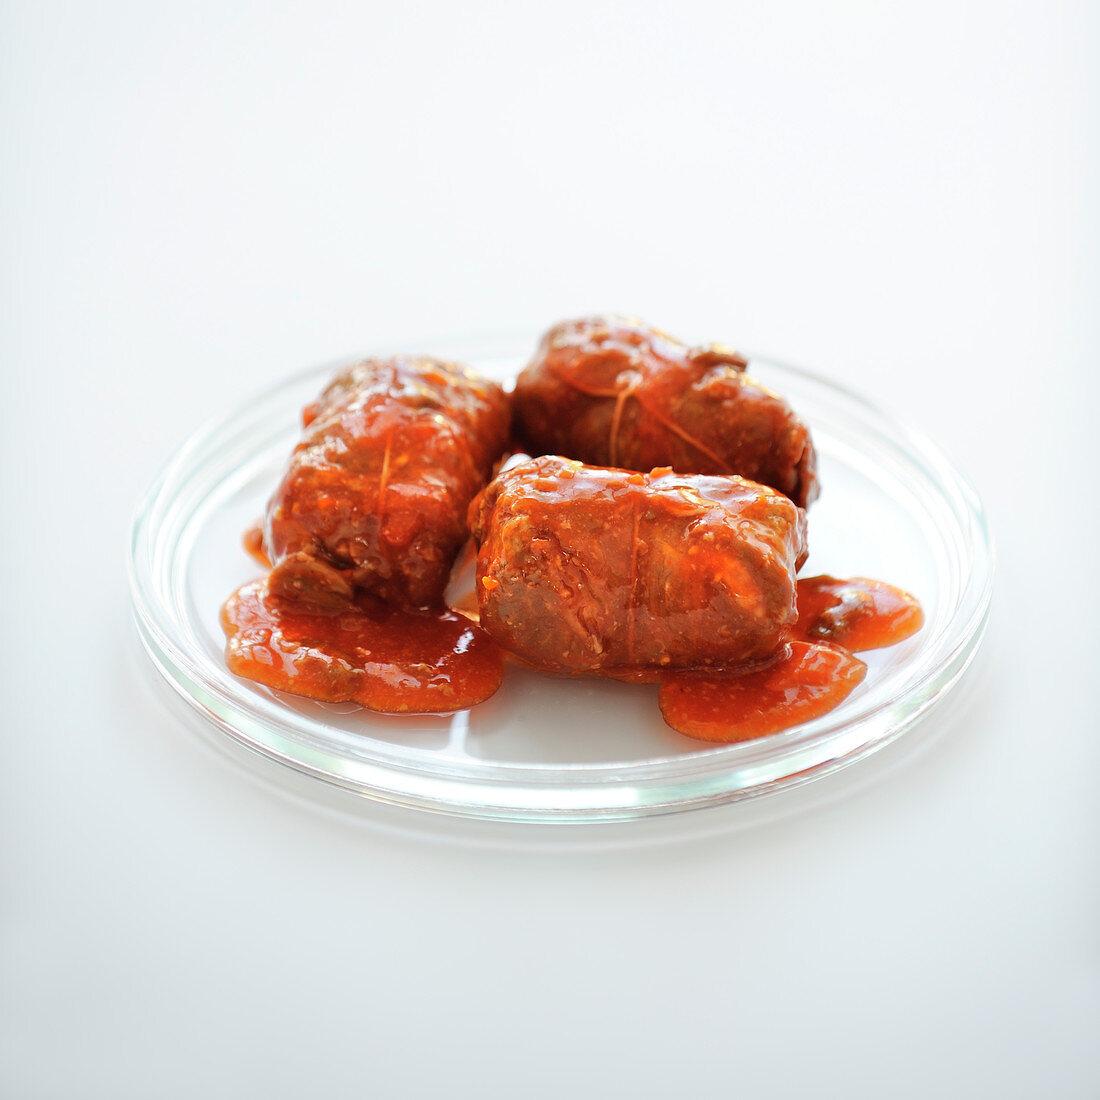 Pork Paupiettes in tomato sauce